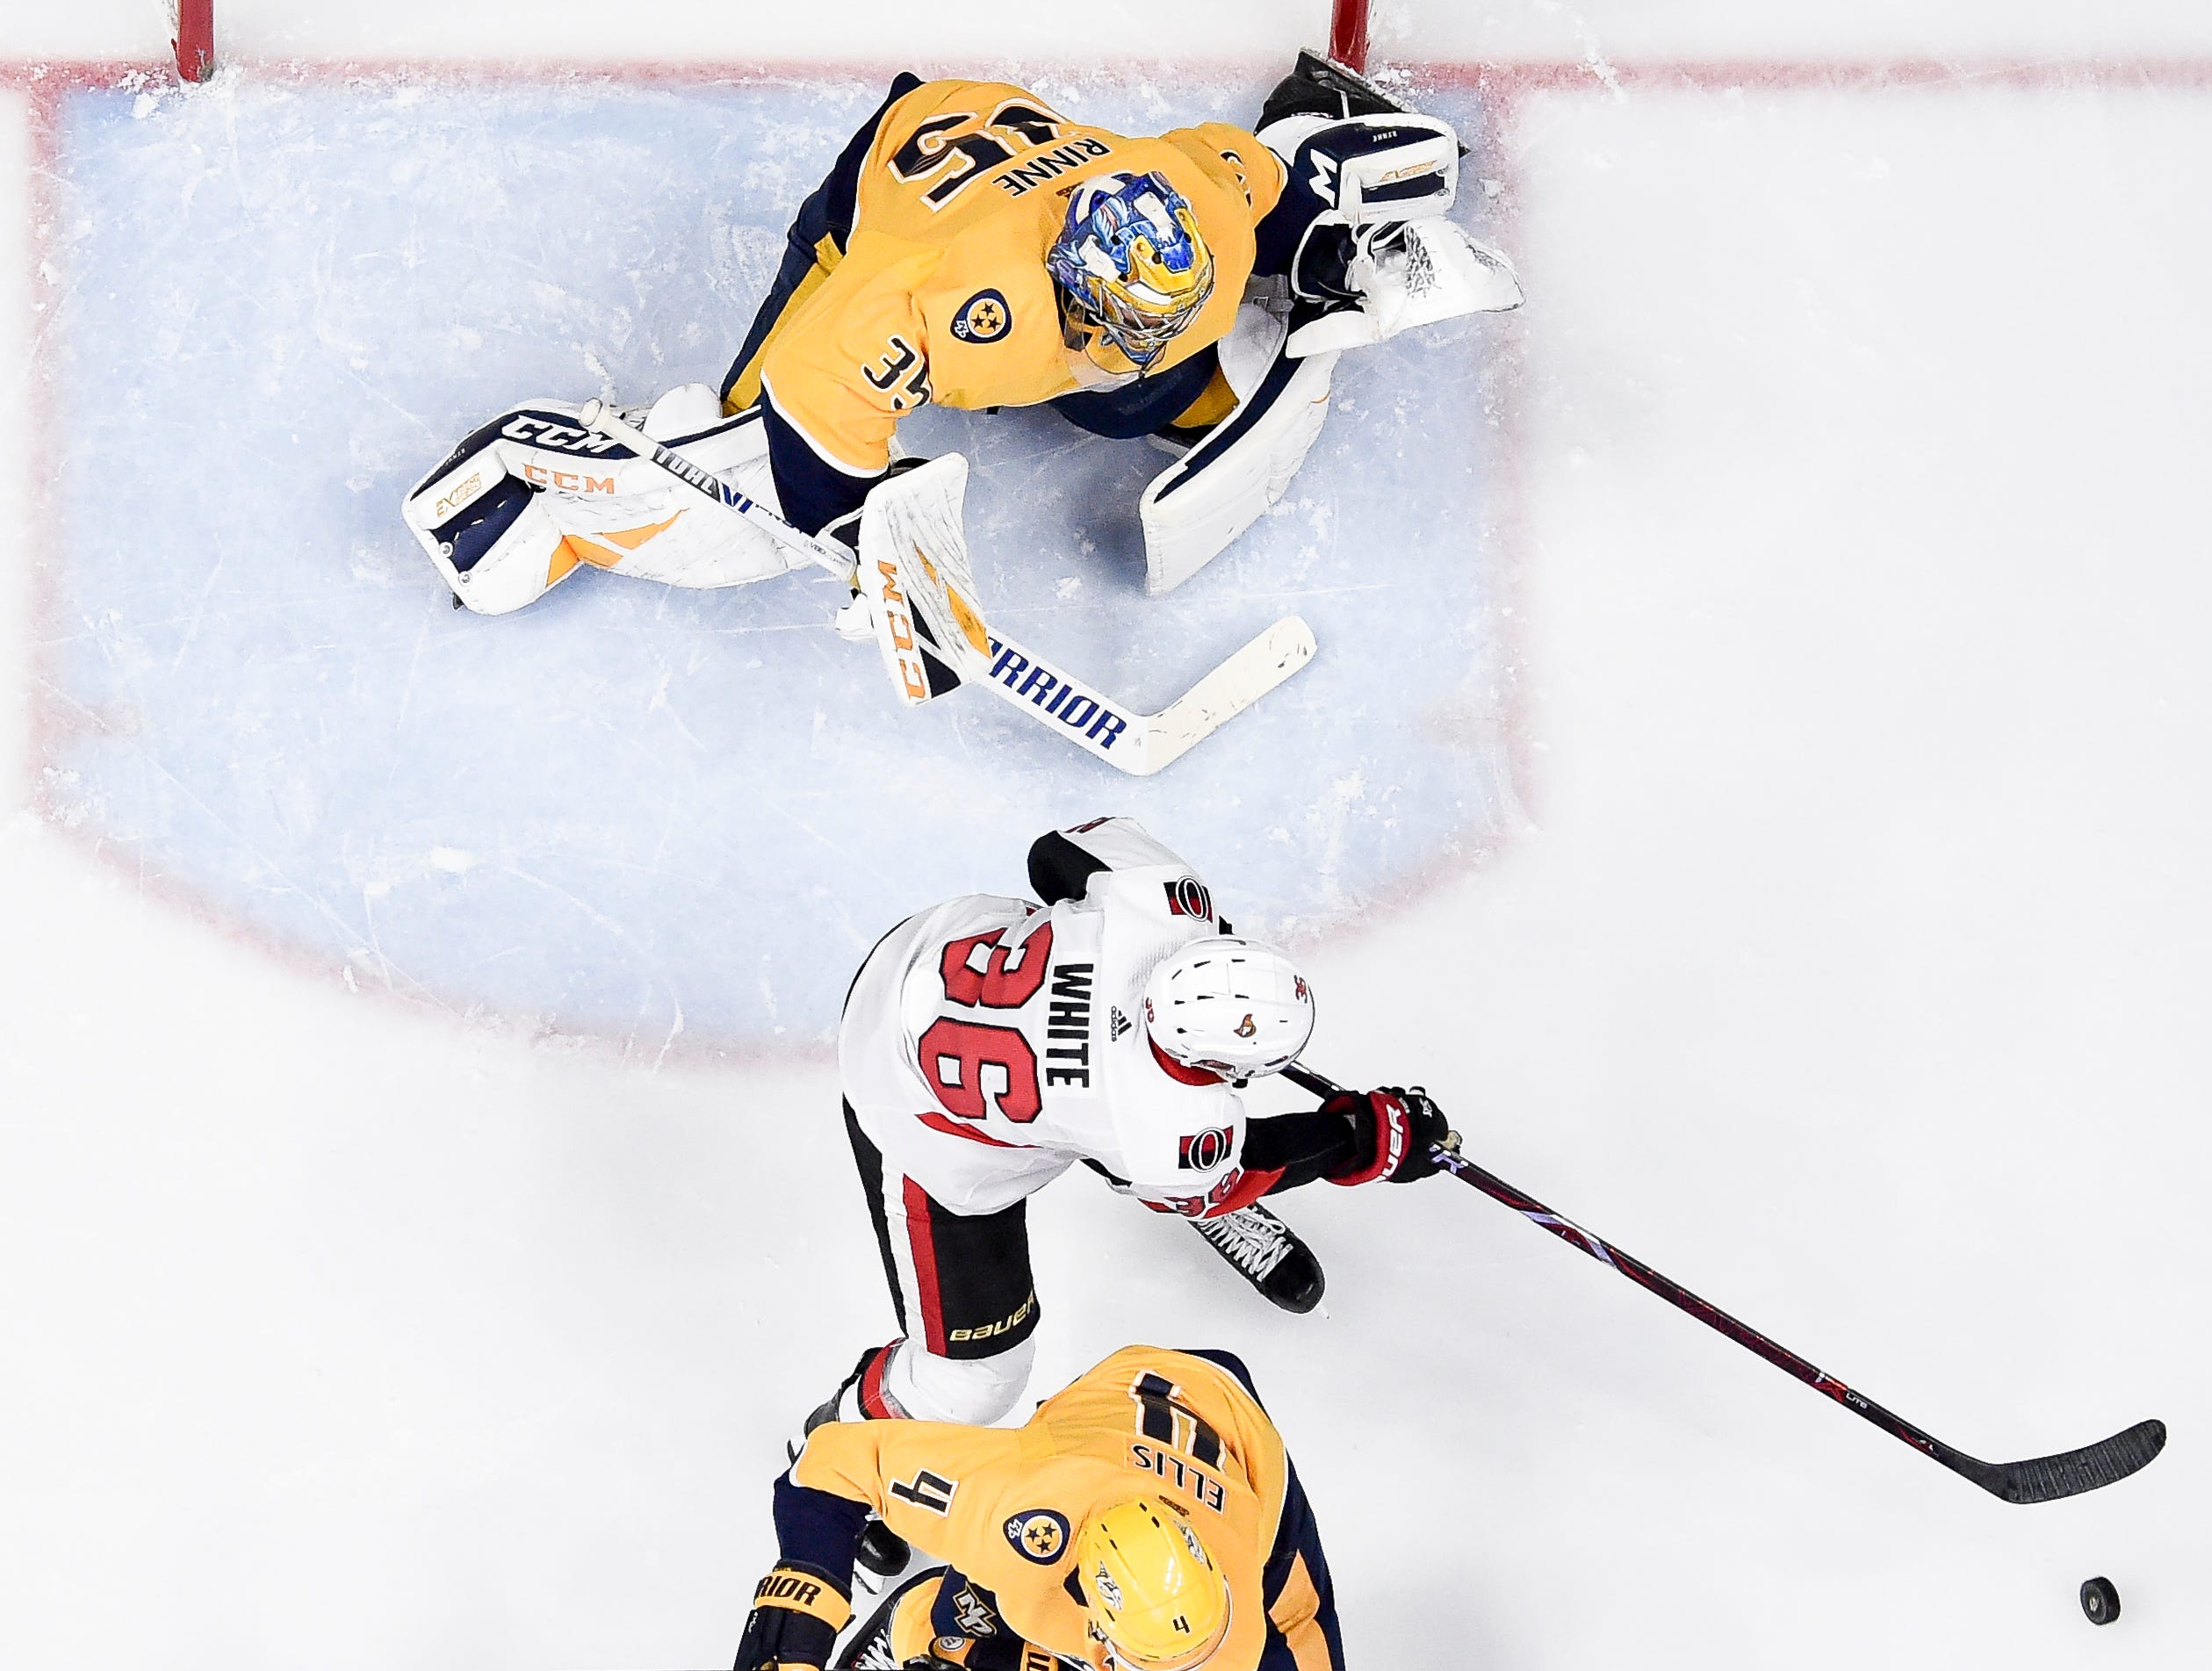 Ottawa Senators center Colin White (36) battles Nashville Predators goaltender Pekka Rinne (35) and defenseman Ryan Ellis (4) during the third period at Bridgestone Arena in Nashville, Tenn., Tuesday, Dec. 11, 2018.